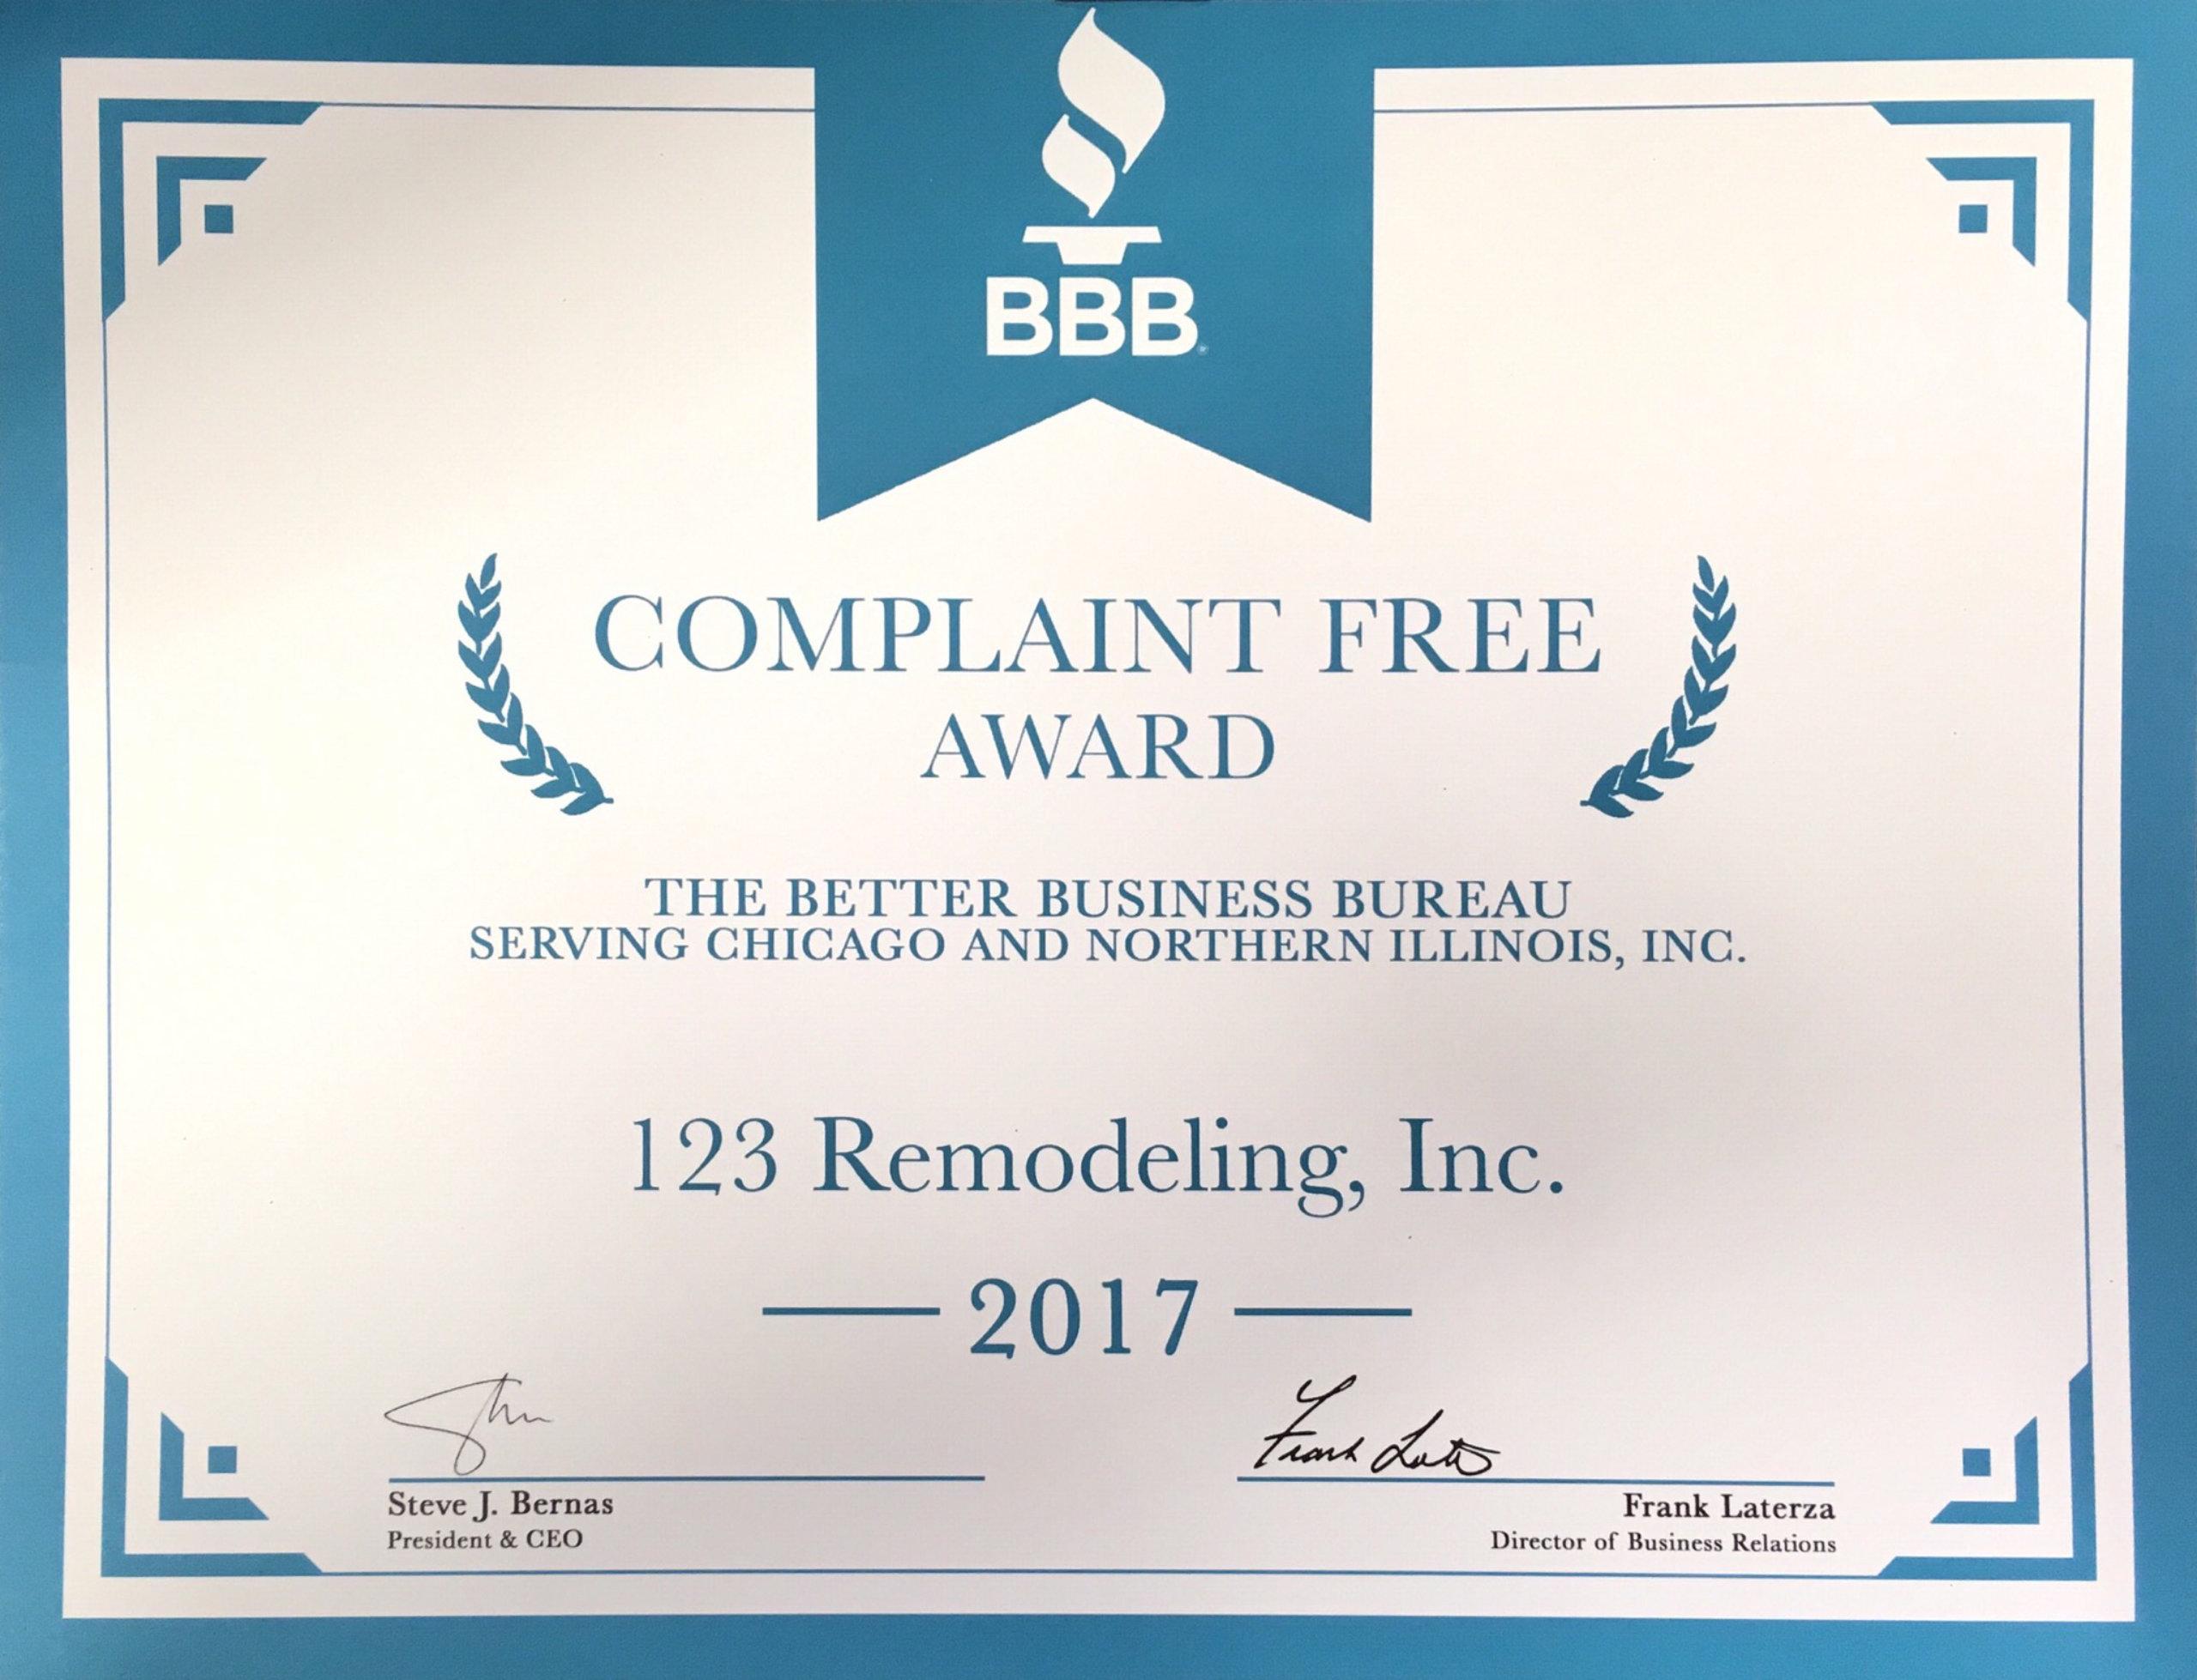 123 Remodeling Complaint Free Award 2017